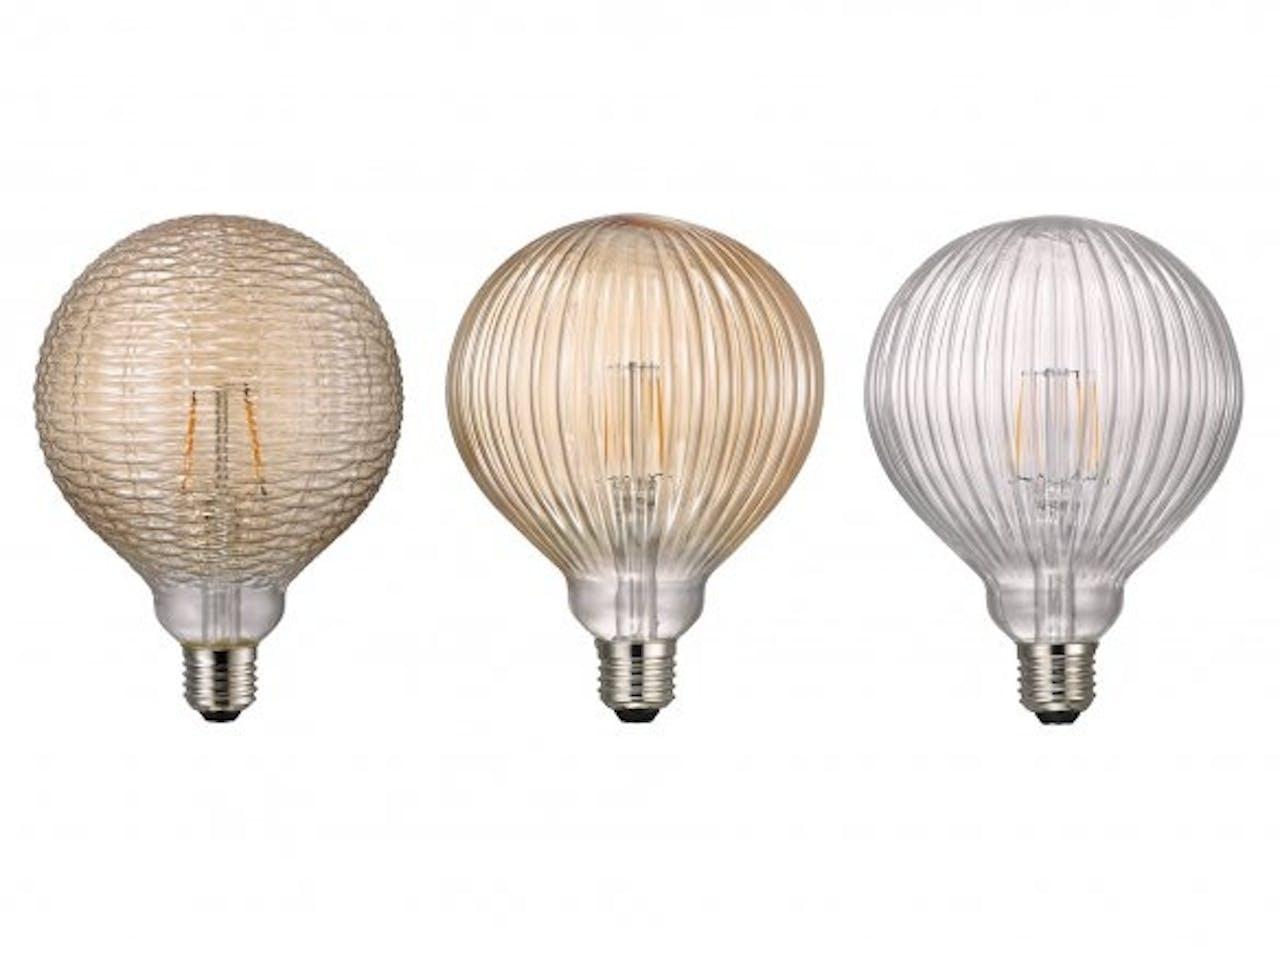 Nordlux LED Leuchtmittel AVRA